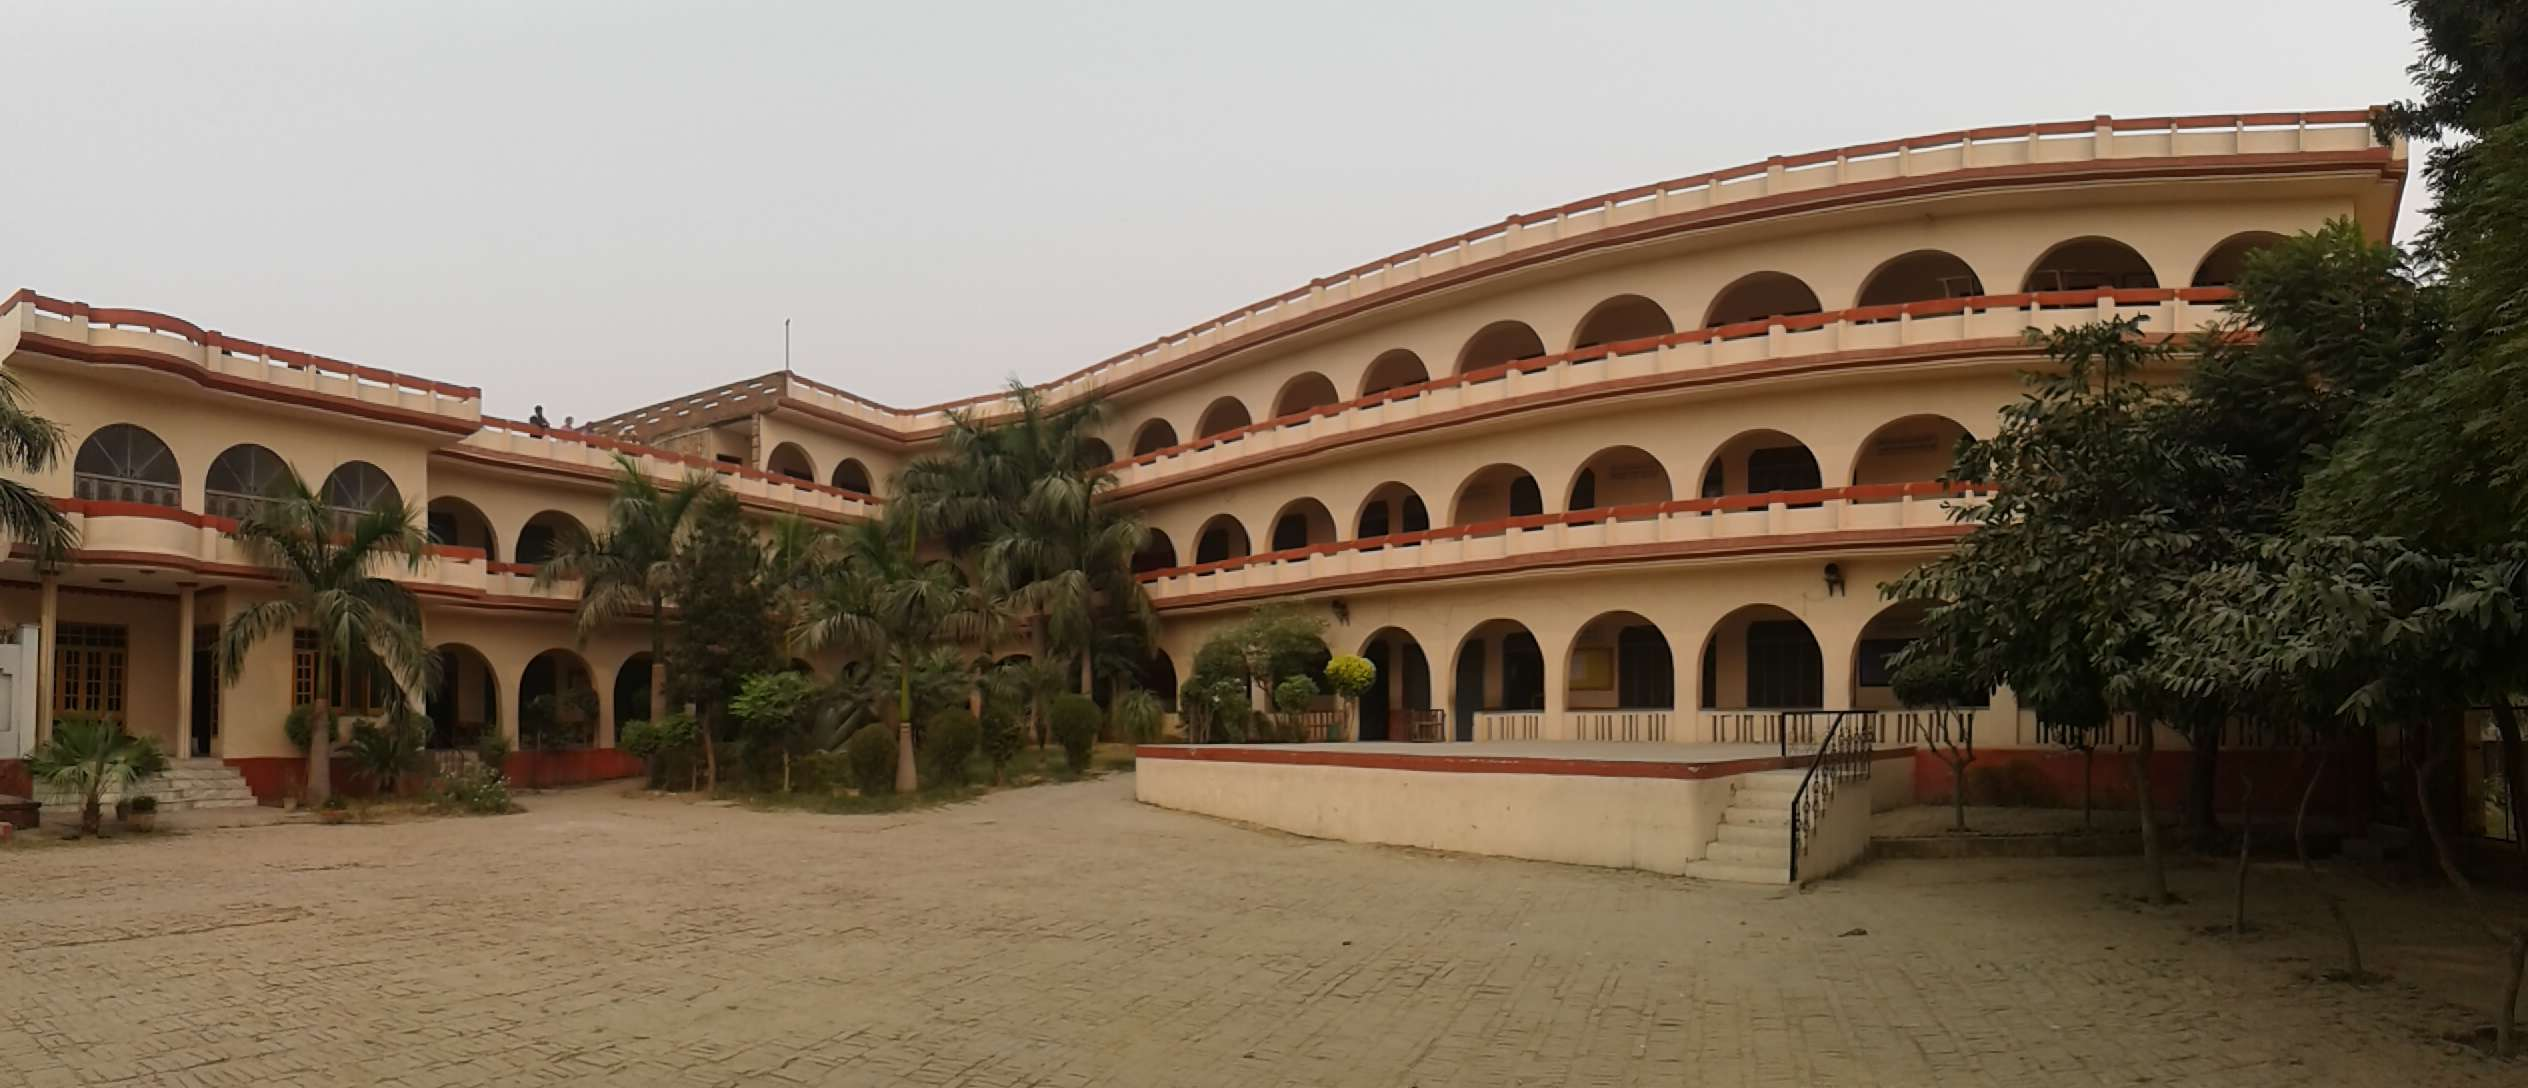 SANT SAR PUBLIC SCHOOL BUTALA DISTT AMRITSAR PUNJAB 1630278